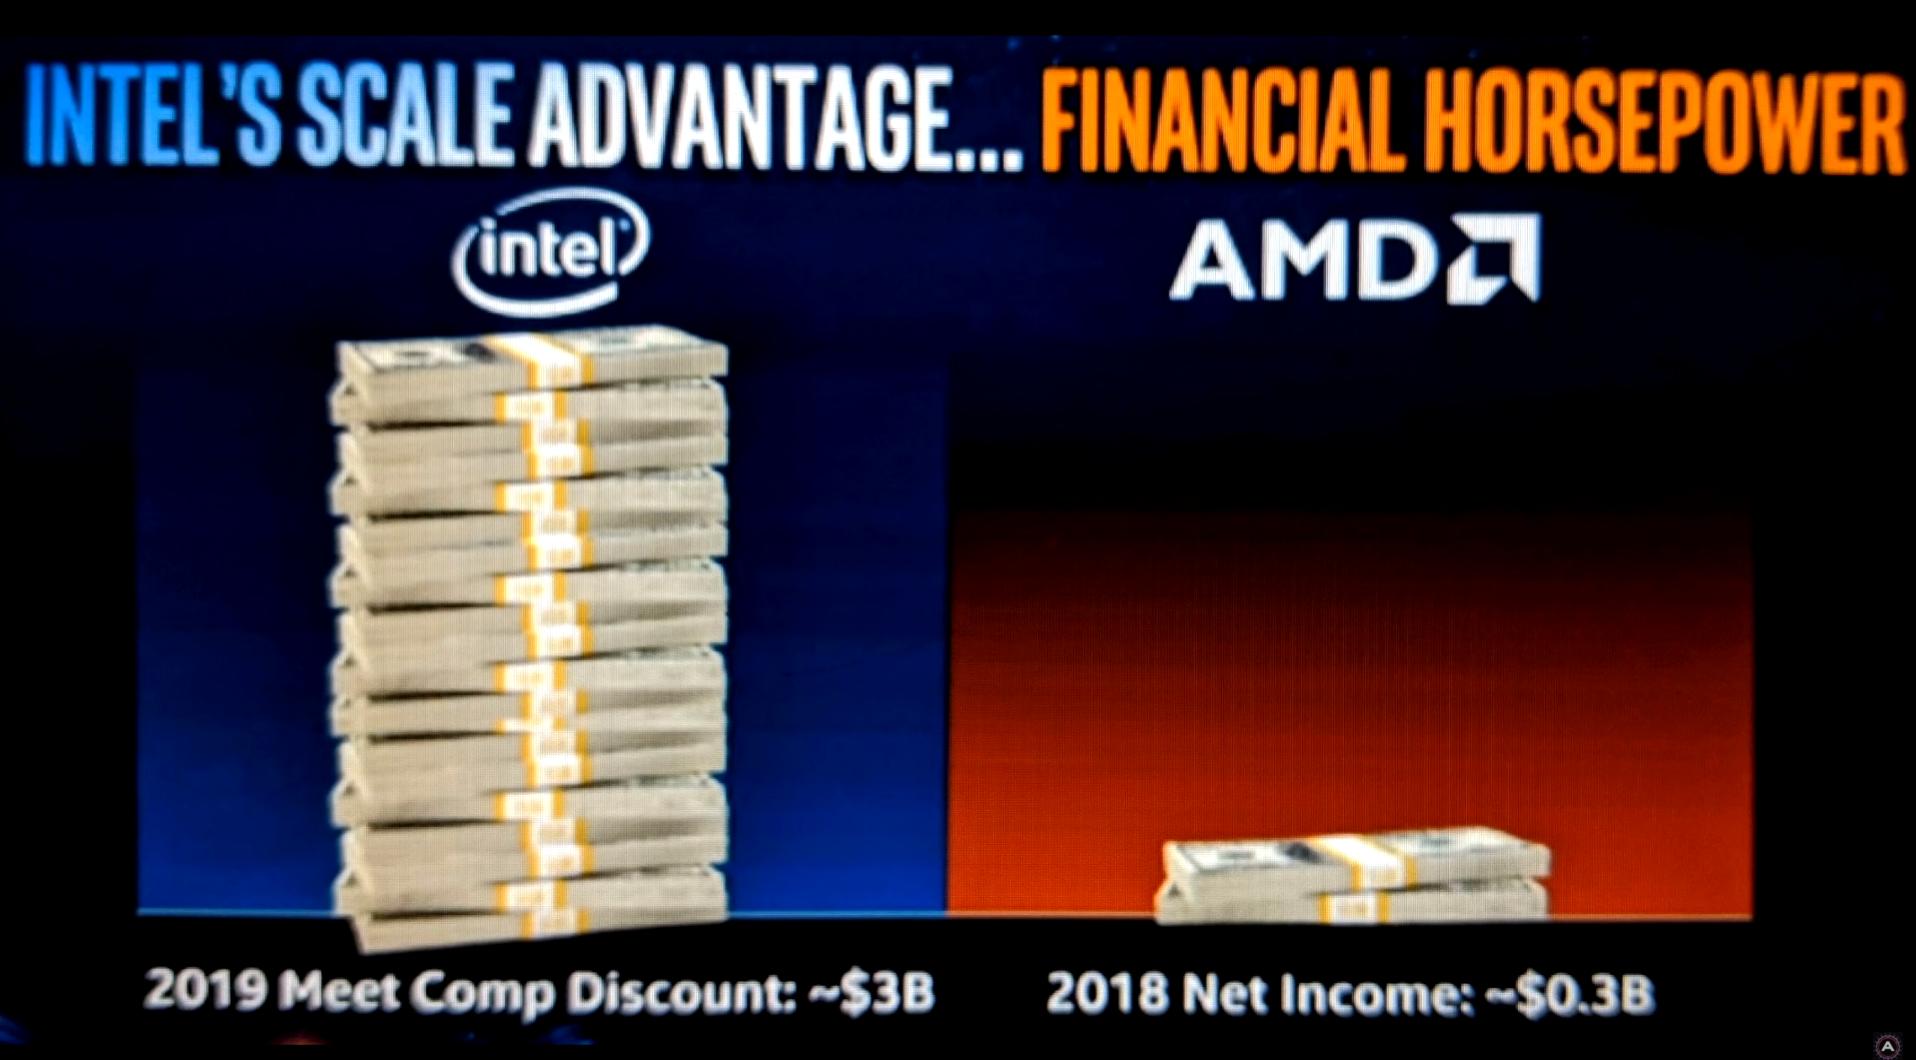 Intel vs amd 2019